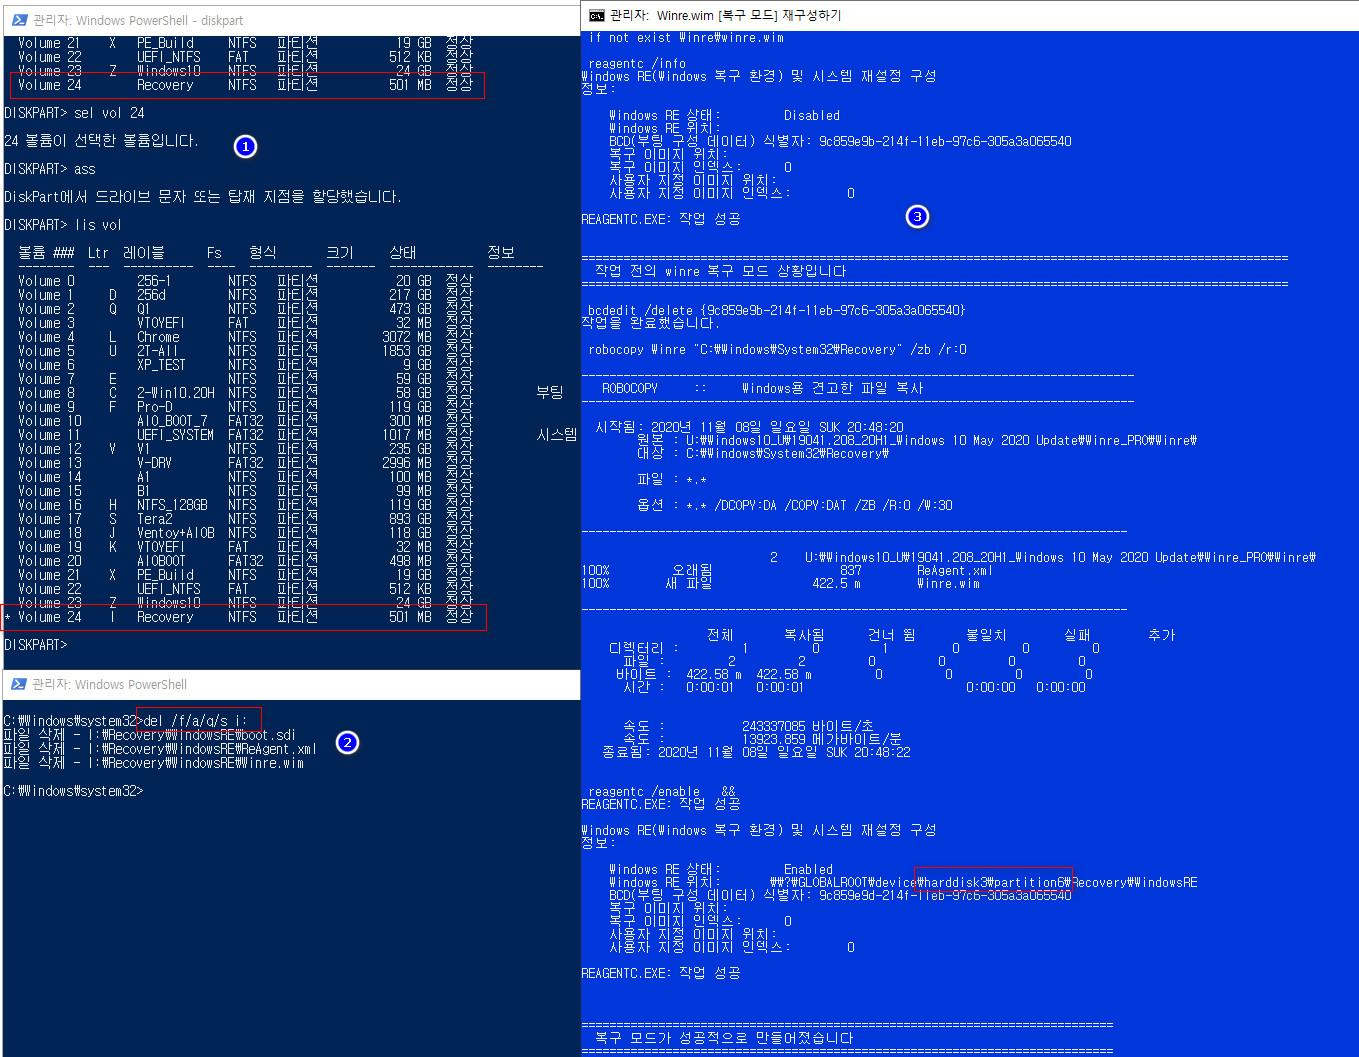 Winre.wim [복구 모드] 재구성하기 2020-11-08.bat 테스트 - 실컴에서 UEFI 모드, GPT 디스크에 복구 파티션을 만드니까 그 파티션에 winre.wim가 만들어집니다-연속으로는 안 되네요. 파일 삭제하고 bat 실행하면 되긴 됩니다 2020-11-08_204900.jpg